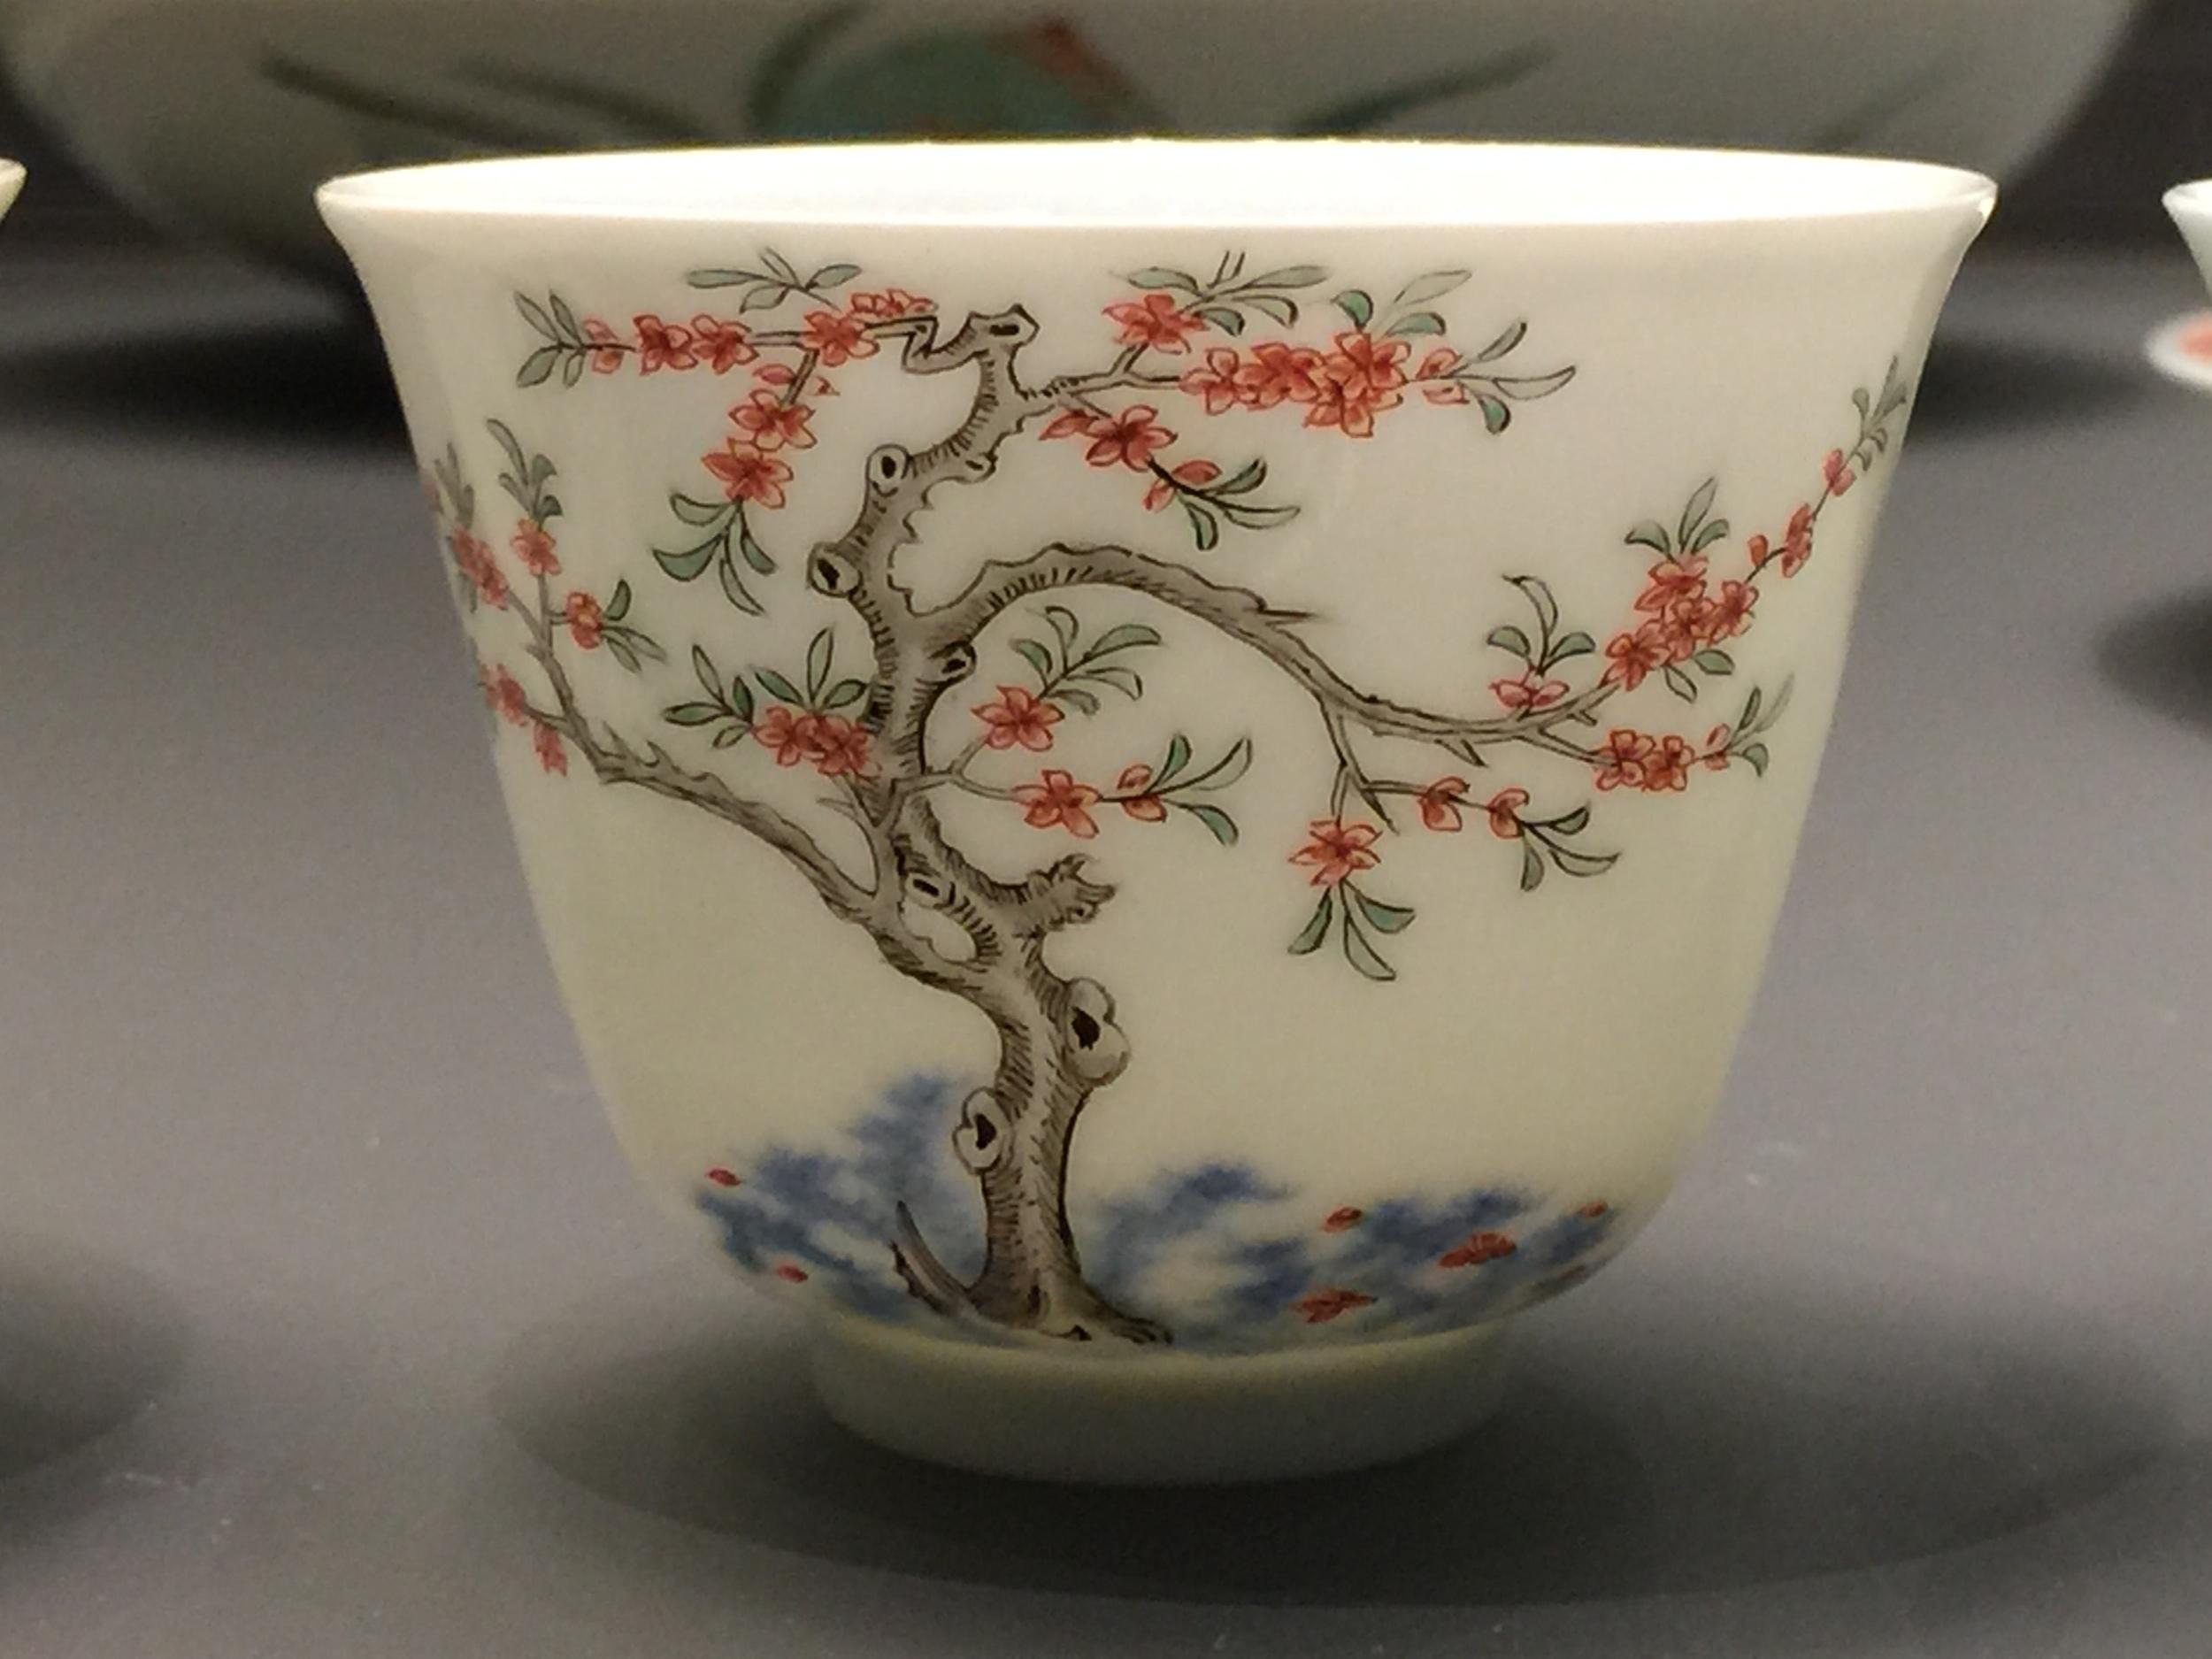 Chinese-Porcelain-British-Museum-Percival-David-jessewaugh.com-123.jpg